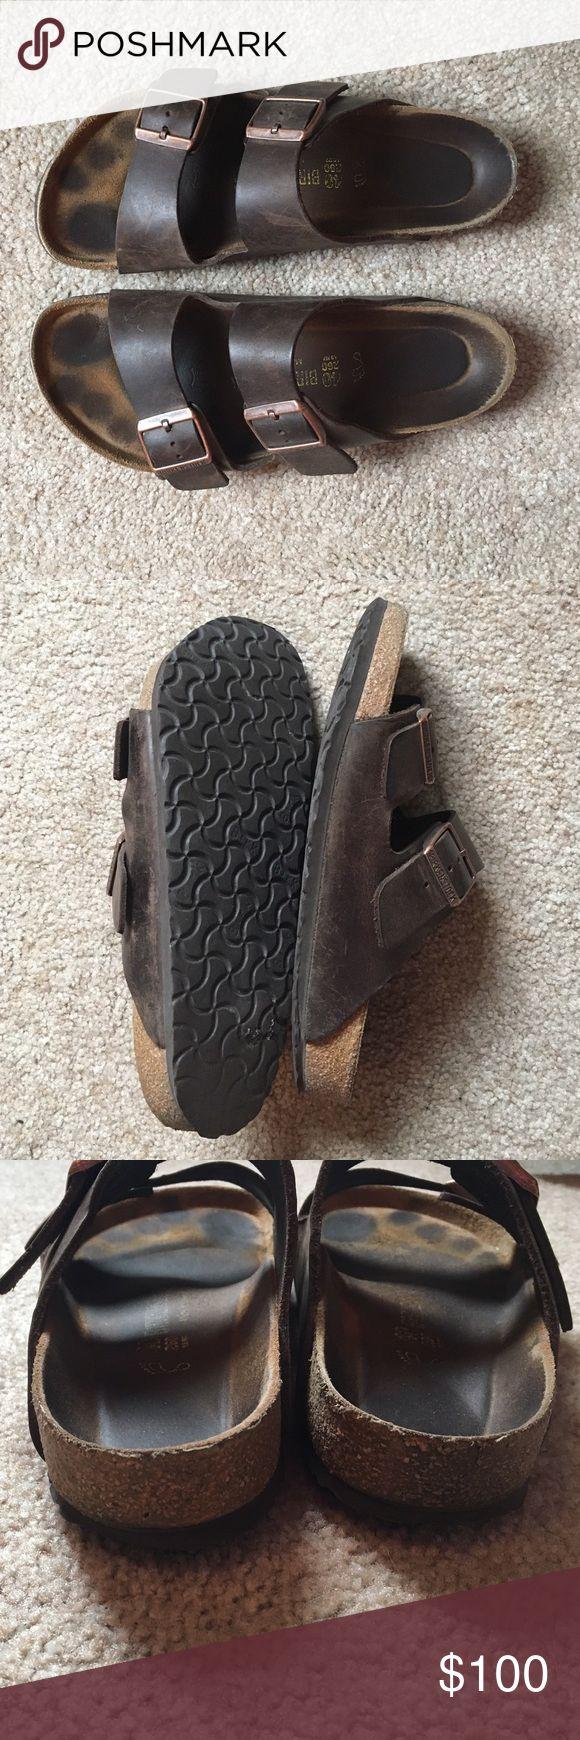 Birkenstock Arizona (Antique Brown Leather) End